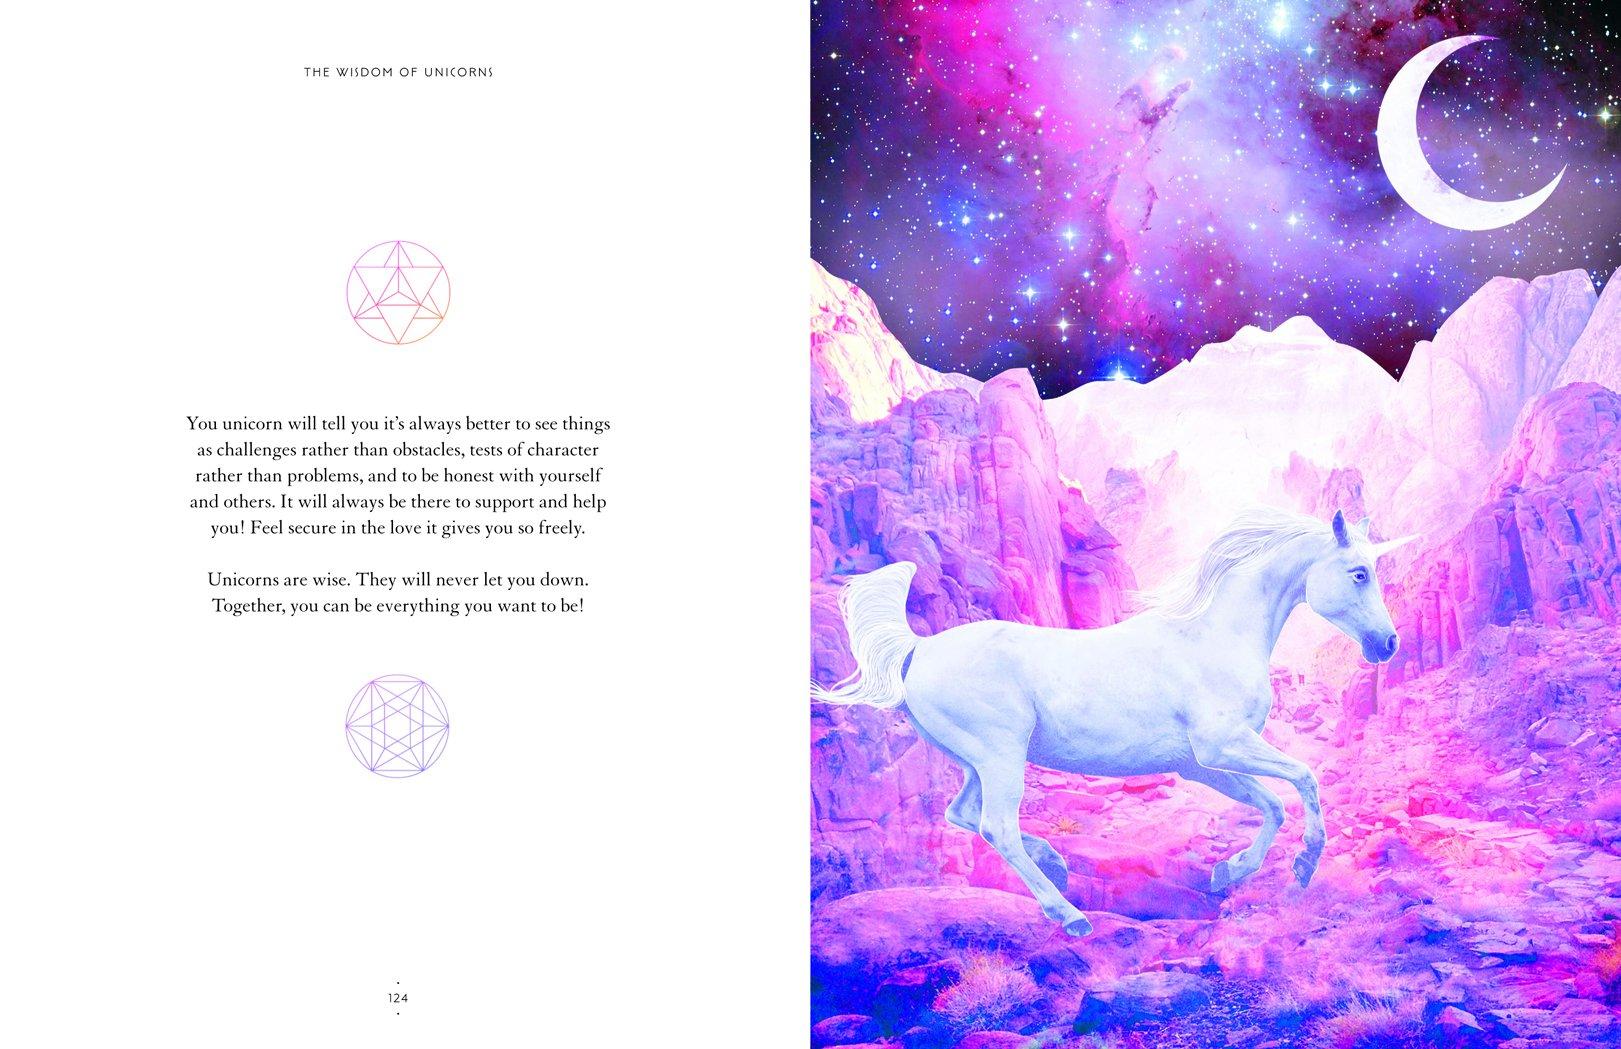 the wisdom of unicorns joules taylor 9781785037368 amazon com books